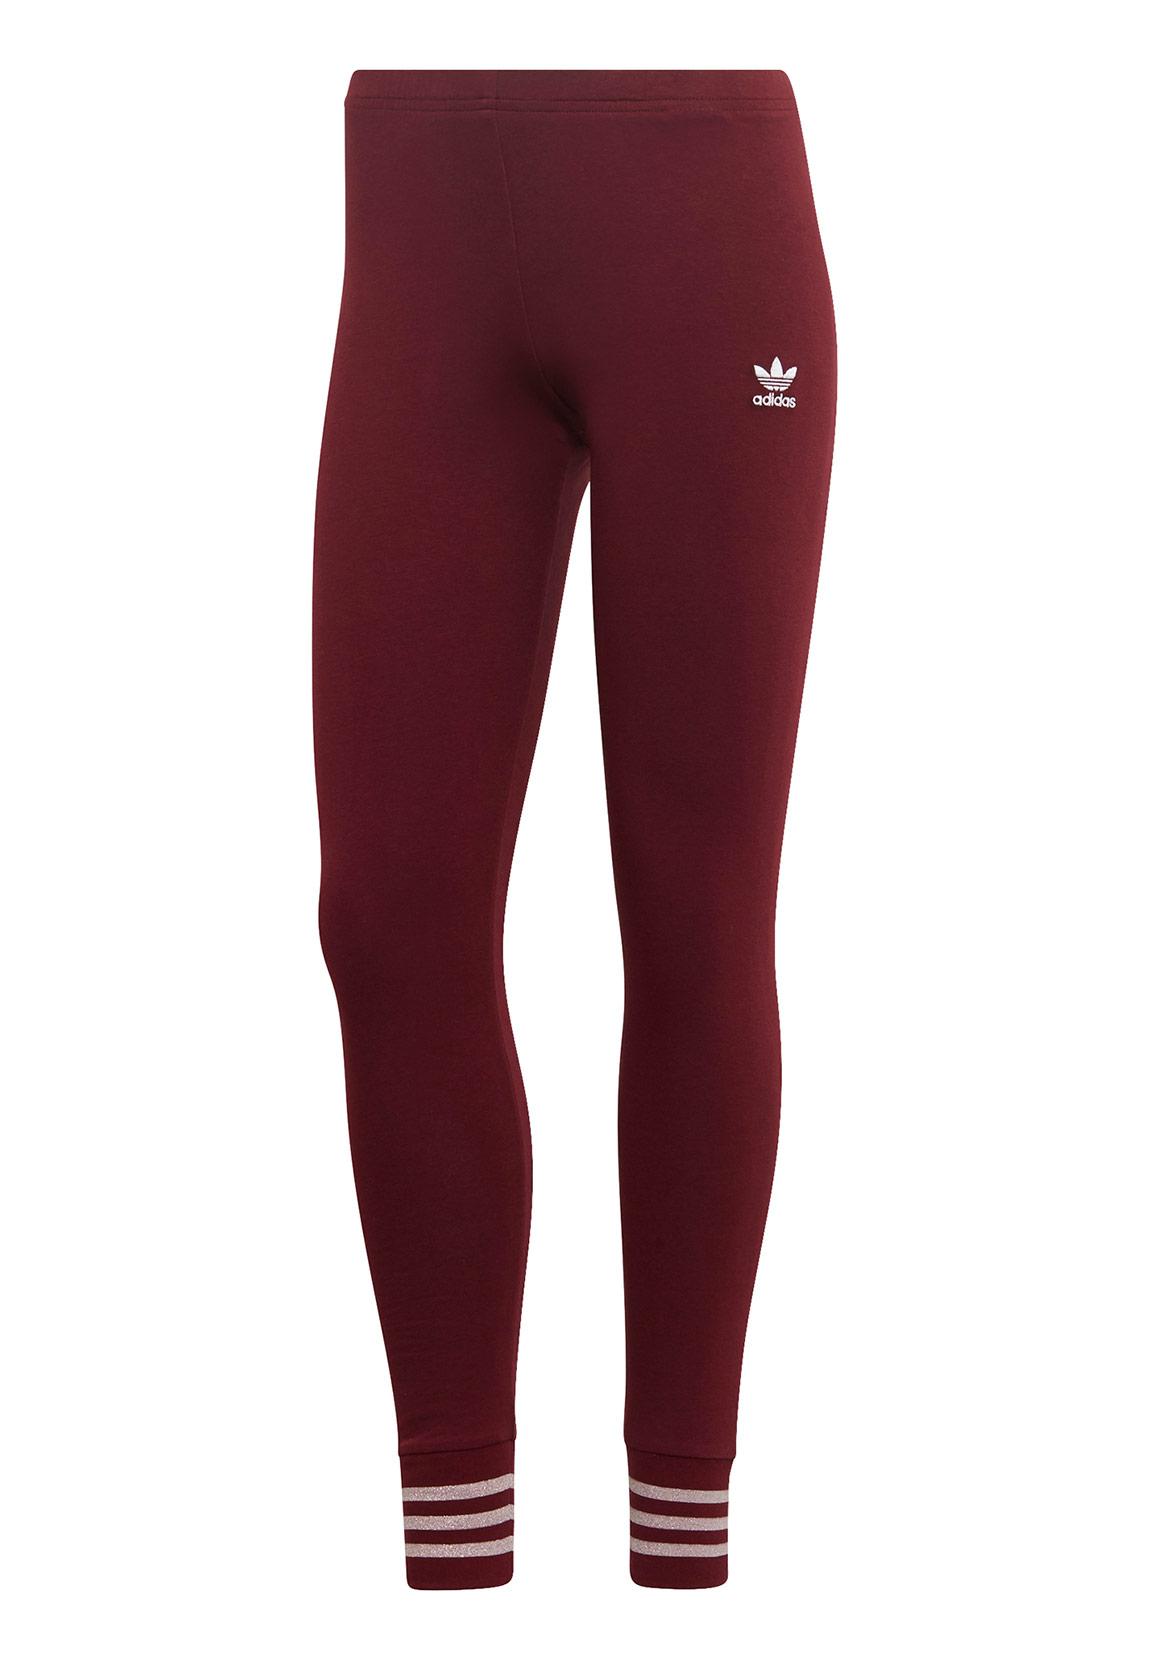 Adidas Originals Leggings Damen TIGHTS ED4788 Dunkelrot